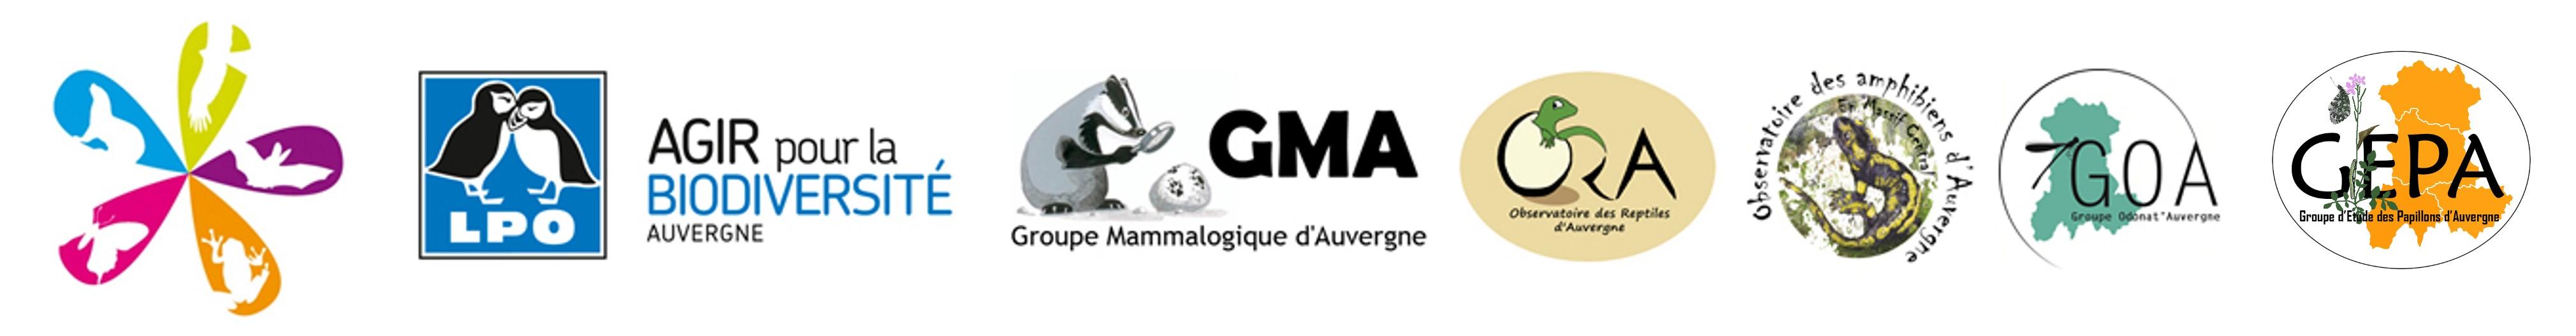 https://cdnfiles2.biolovision.net/www.faune-auvergne.org/userfiles/COORDINATIONFA/logospartenairesfaune-AuvergneV3FG.jpg